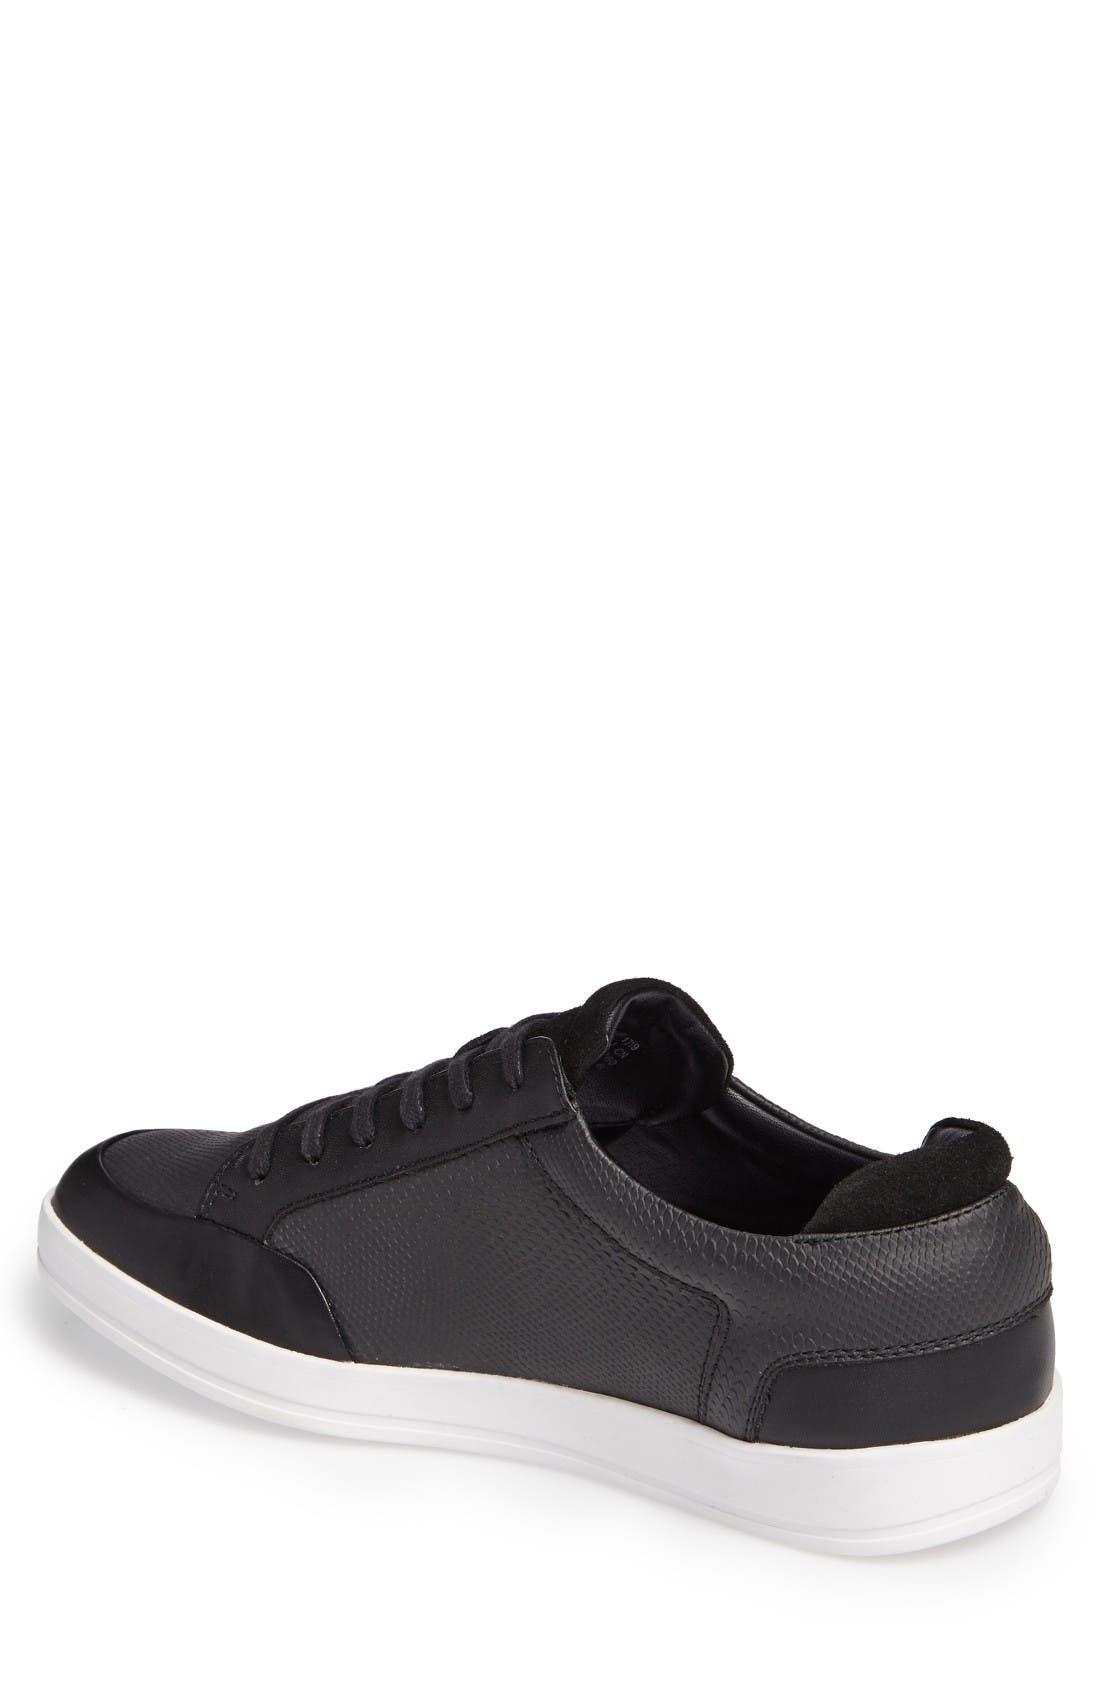 Alternate Image 2  - Calvin Klein Balin Sneaker (Men)